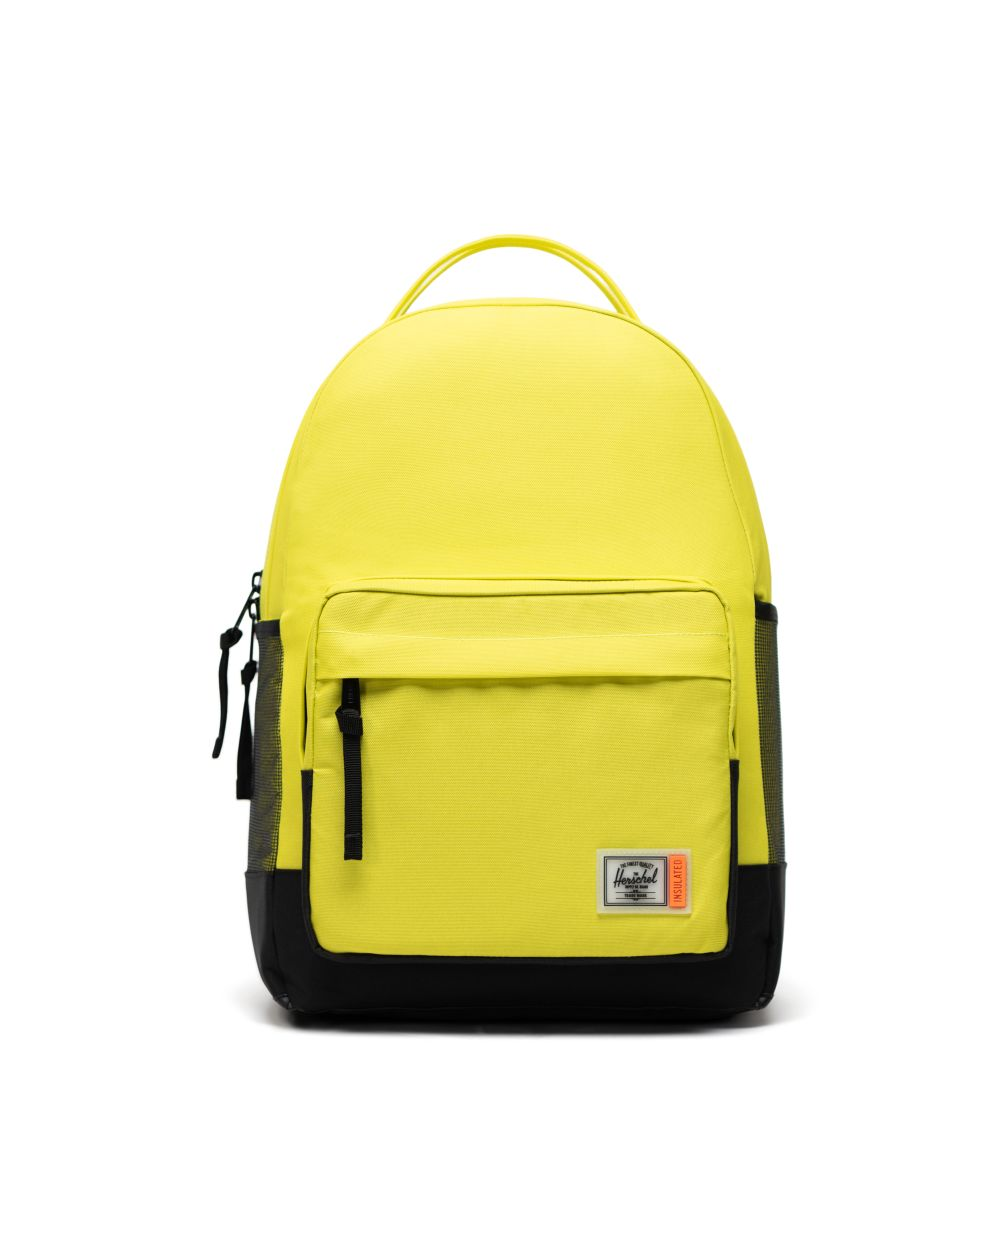 Herschel insulated backpack, best backpacks under $100